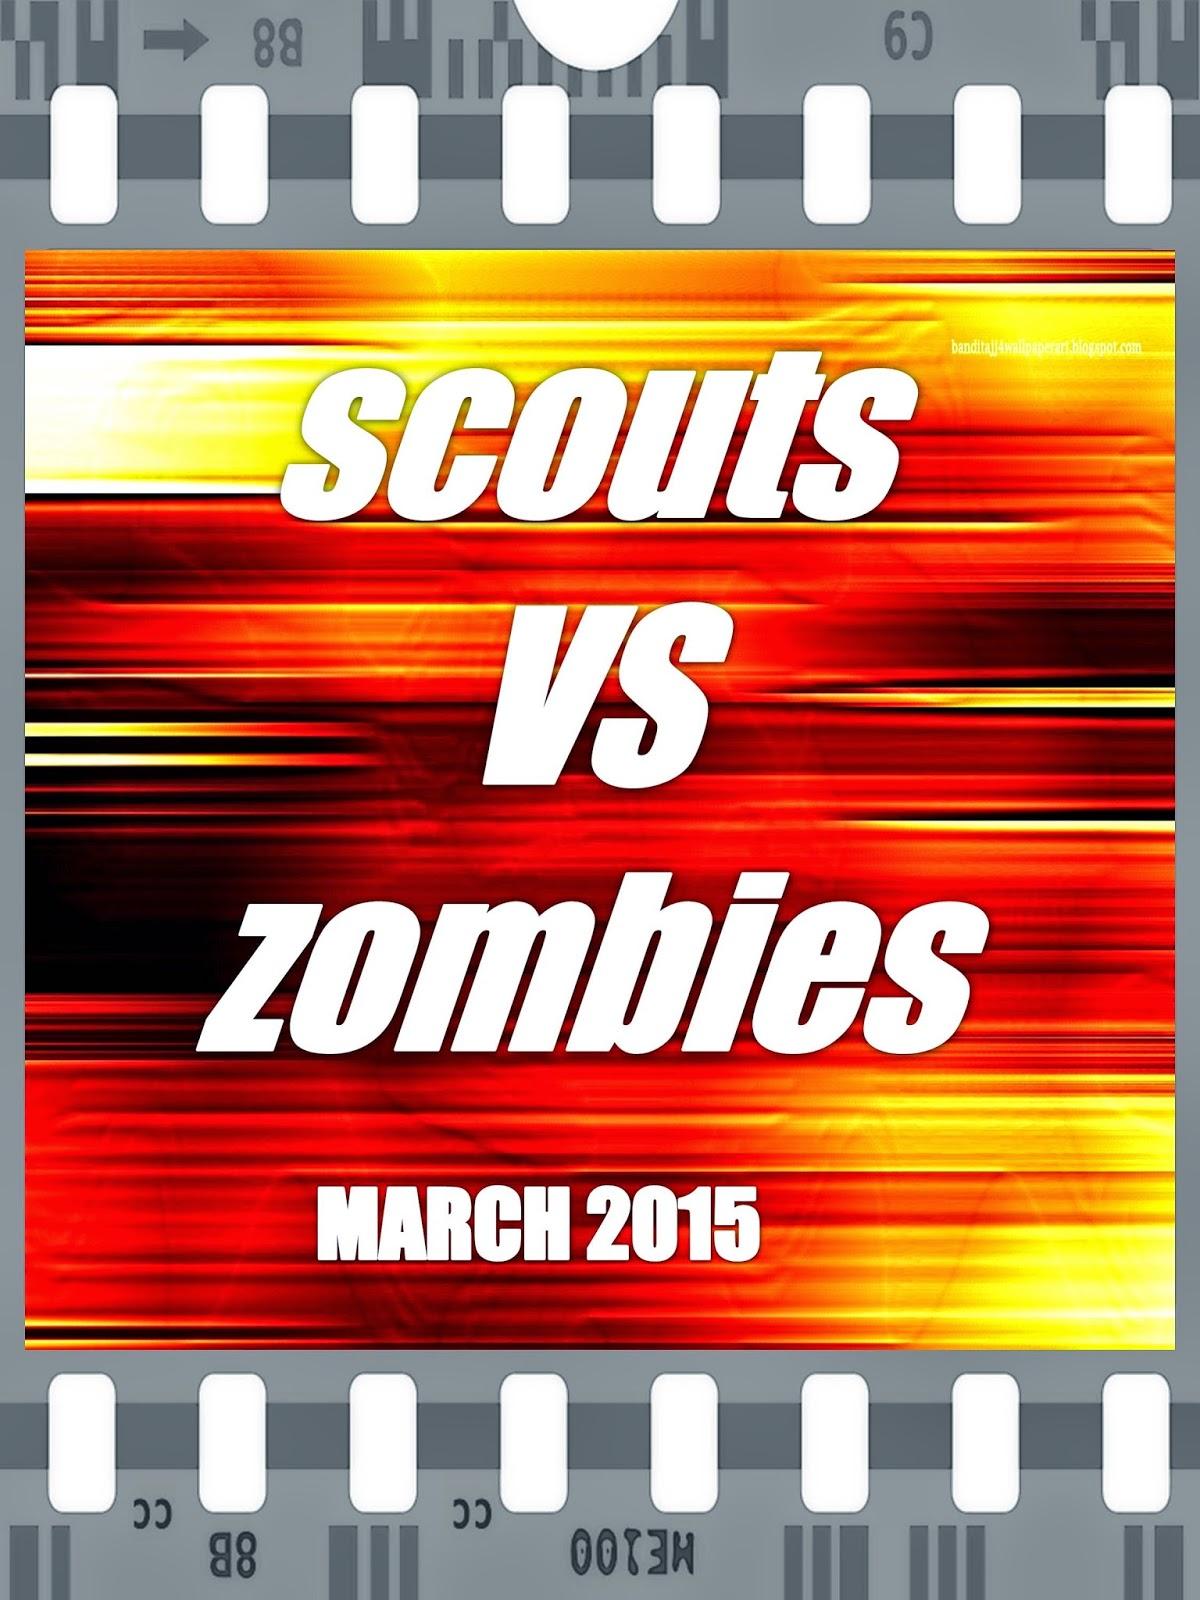 Zombie Vs Scouts